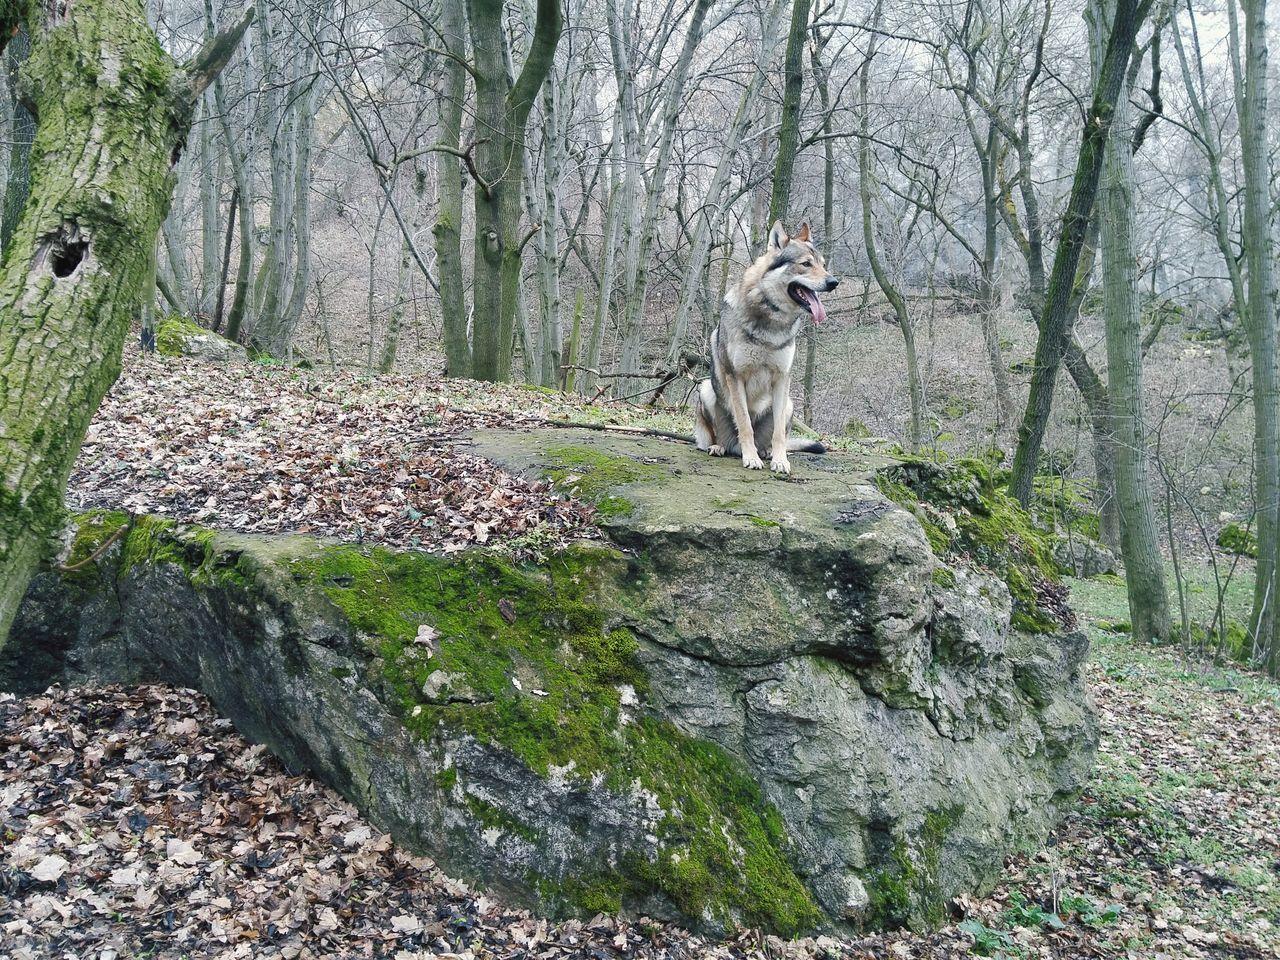 Garon Dog Czechoslovakianwolfdog Nature Animals Wolf Wolfdog Czechwolfdog Taken On Mobile Device